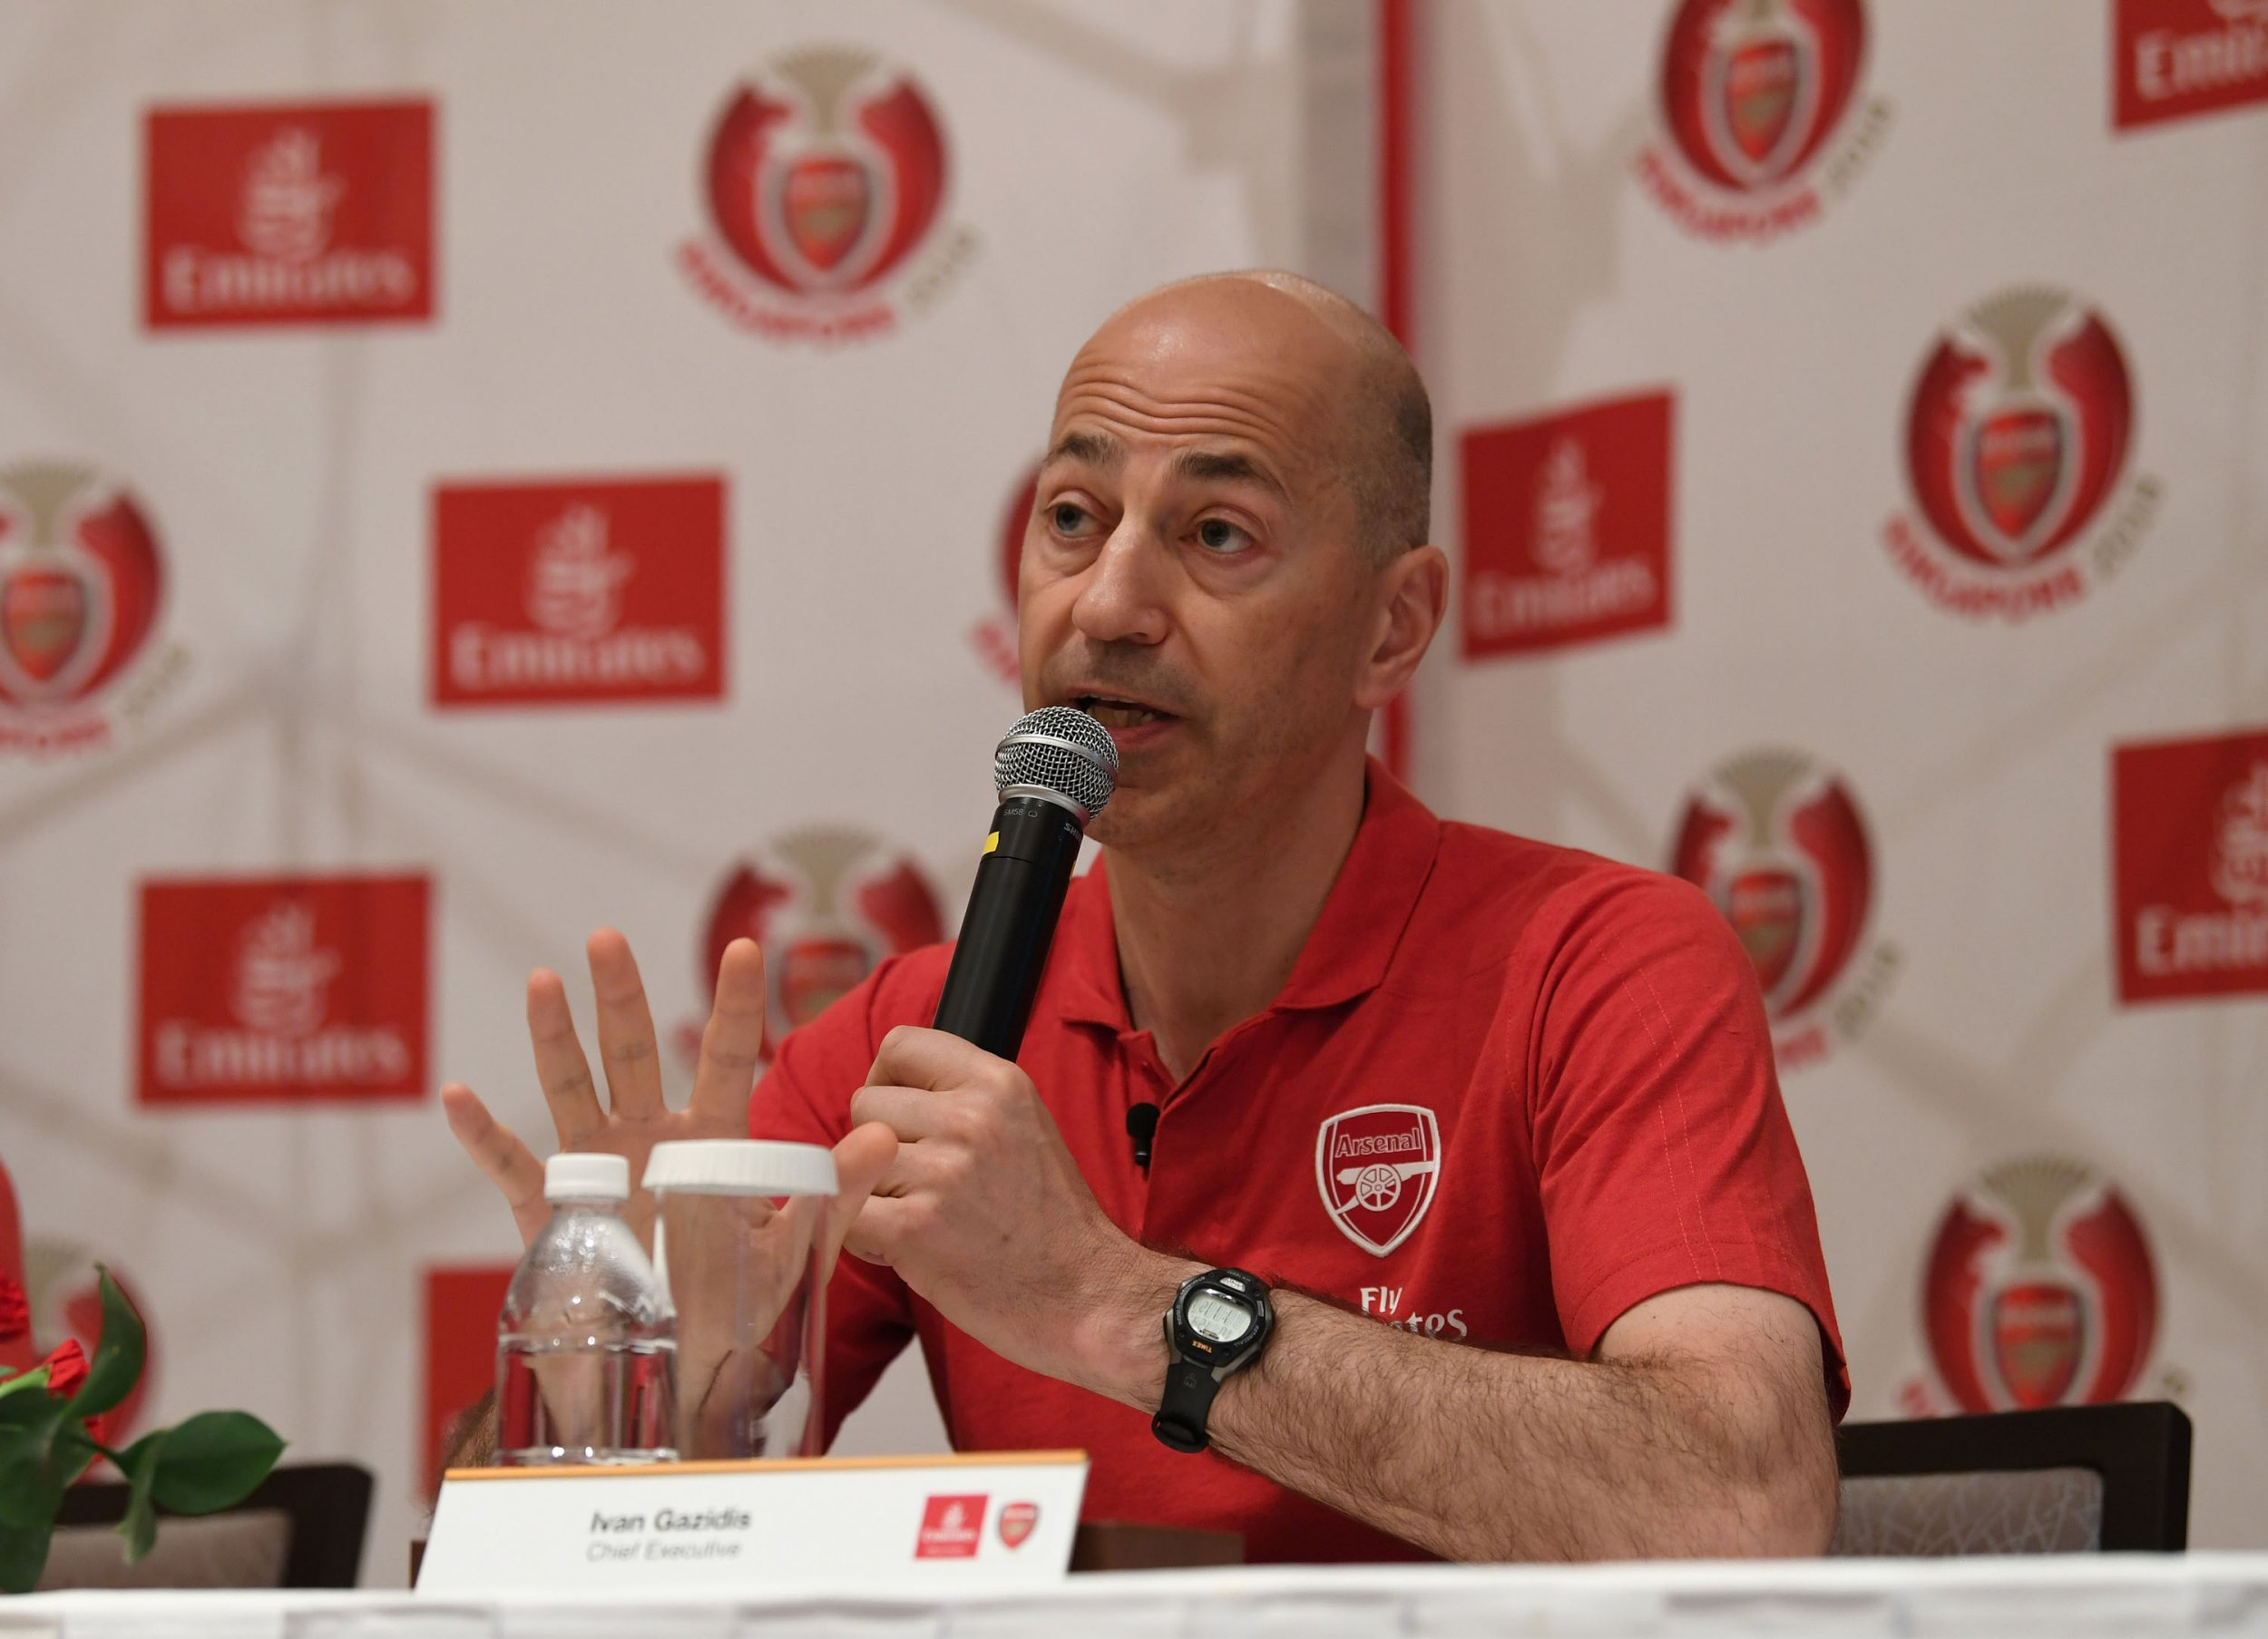 AC Milan target Arsenal midfielder Aaron Ramsey after closing in on Ivan Gazidis appointment